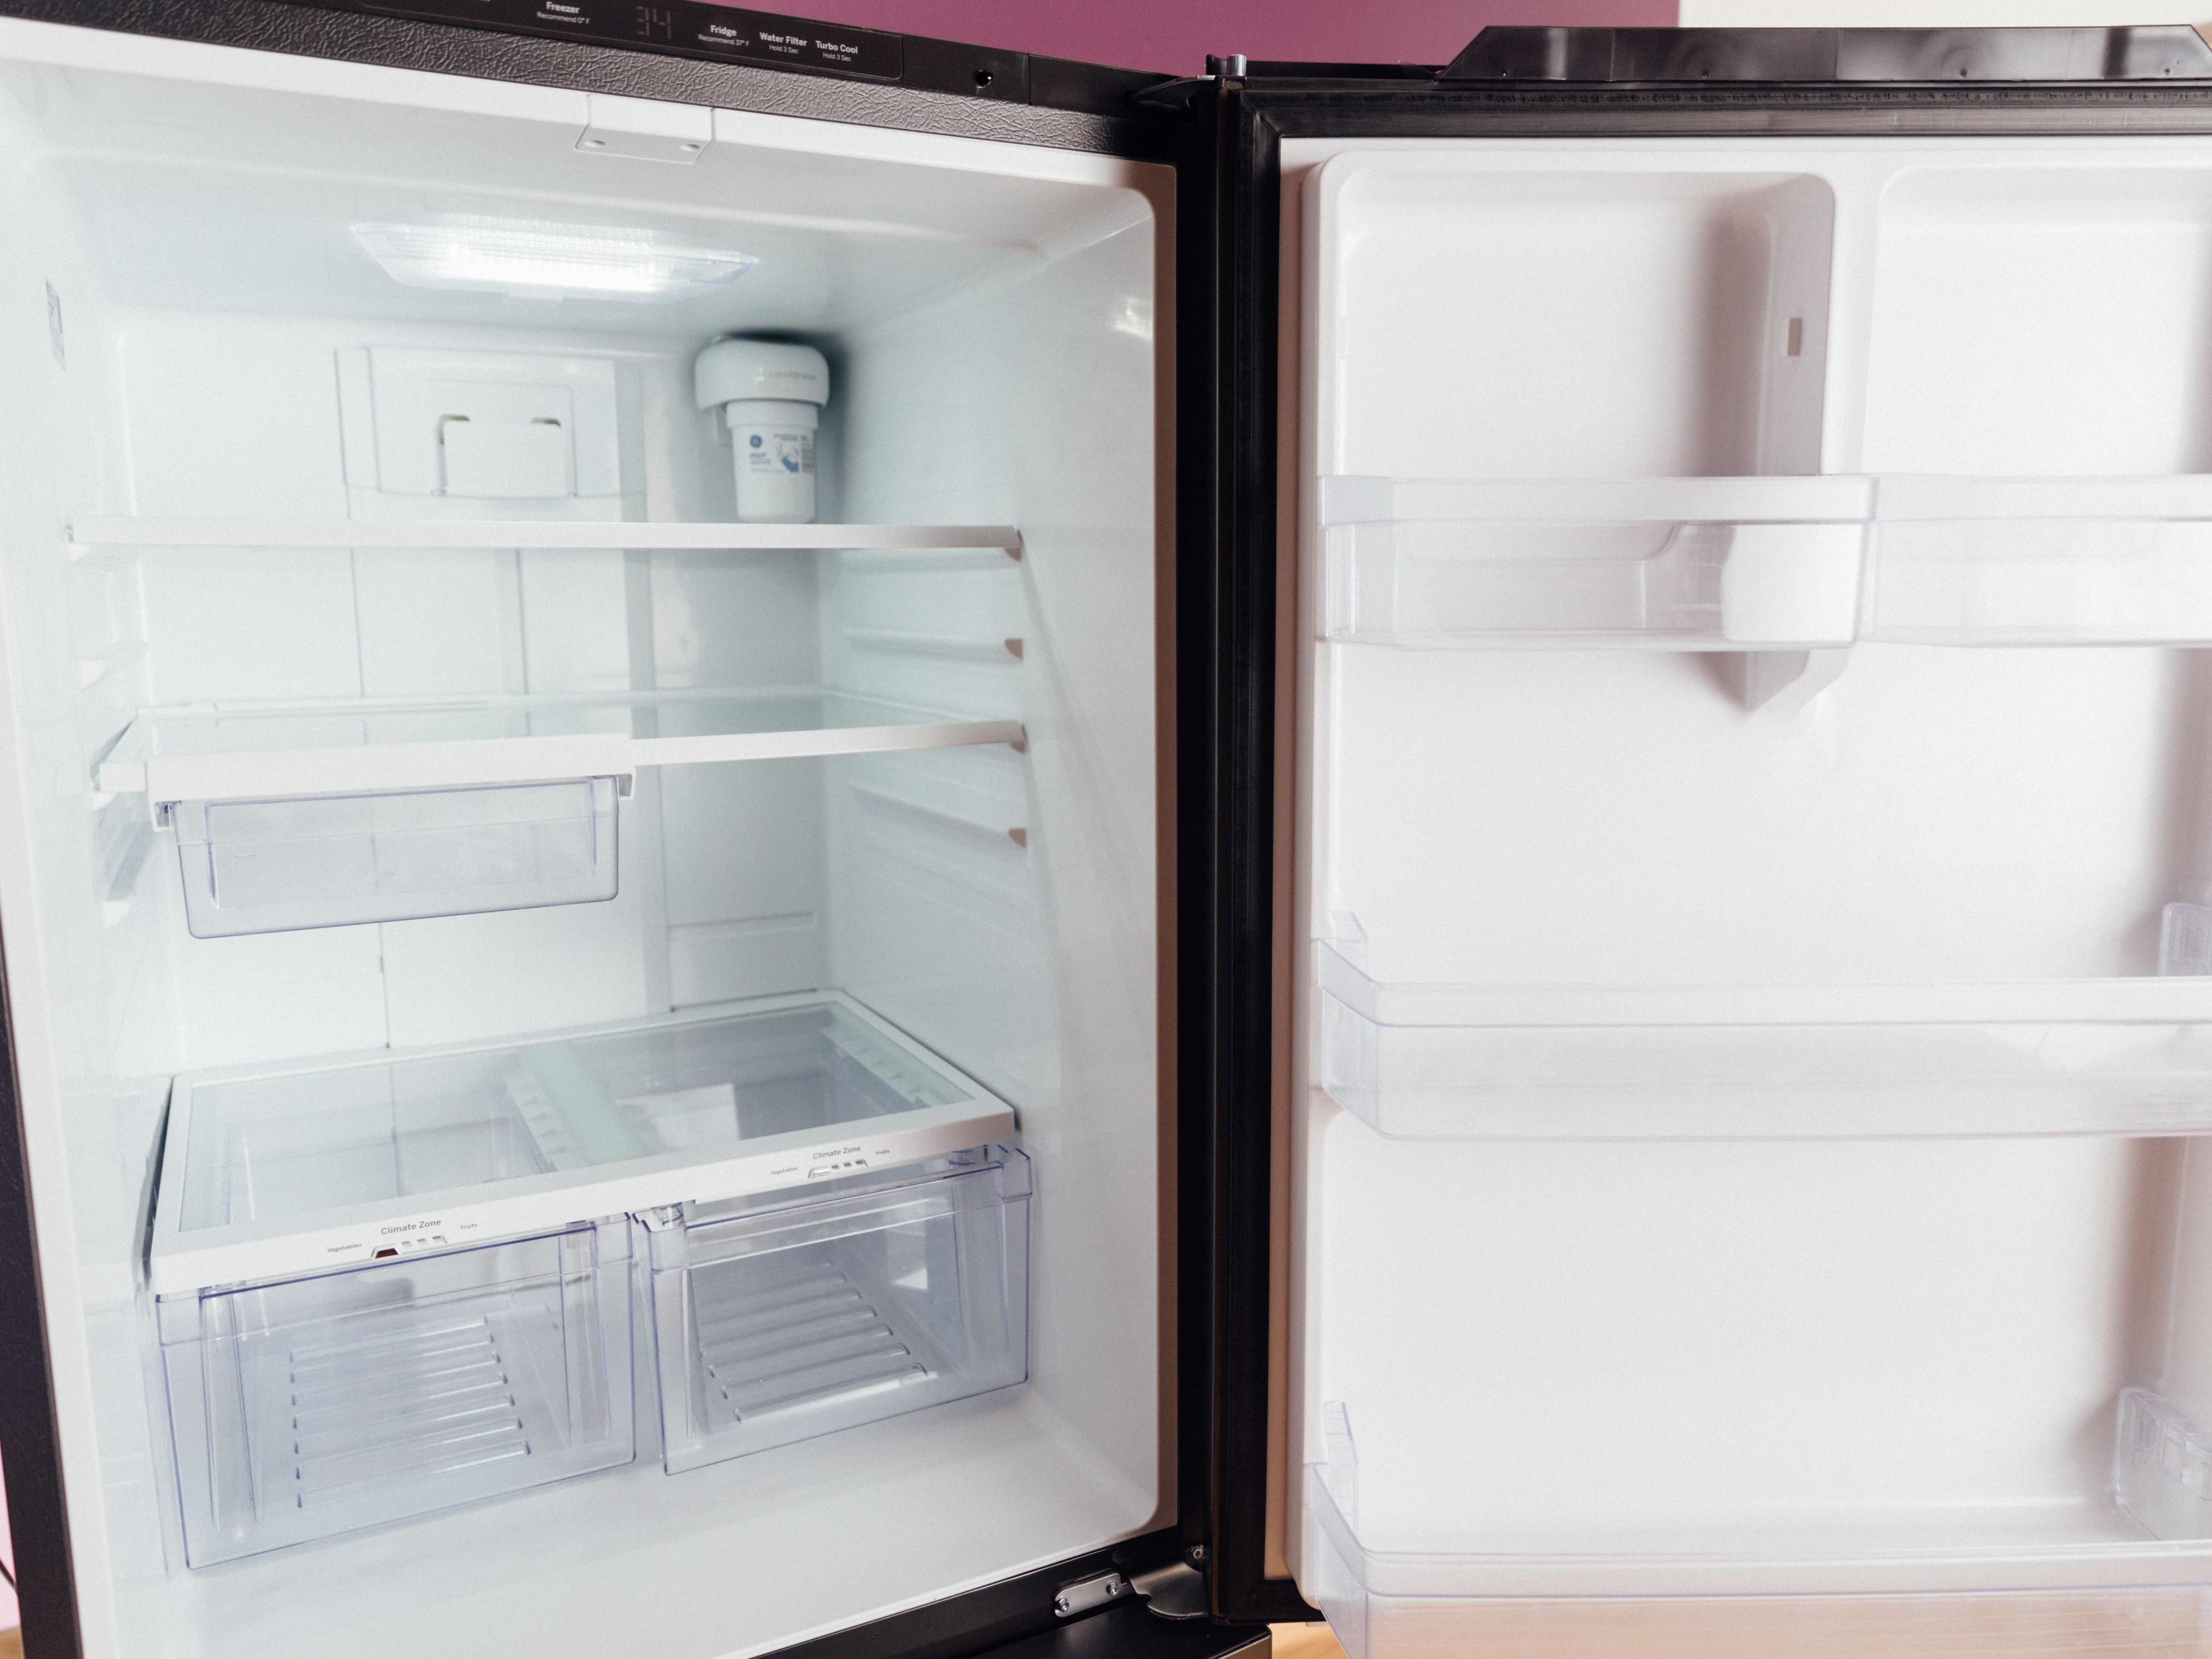 ge-gde21emkes-bottom-freezer-refrigerator-product-photos-2.jpg